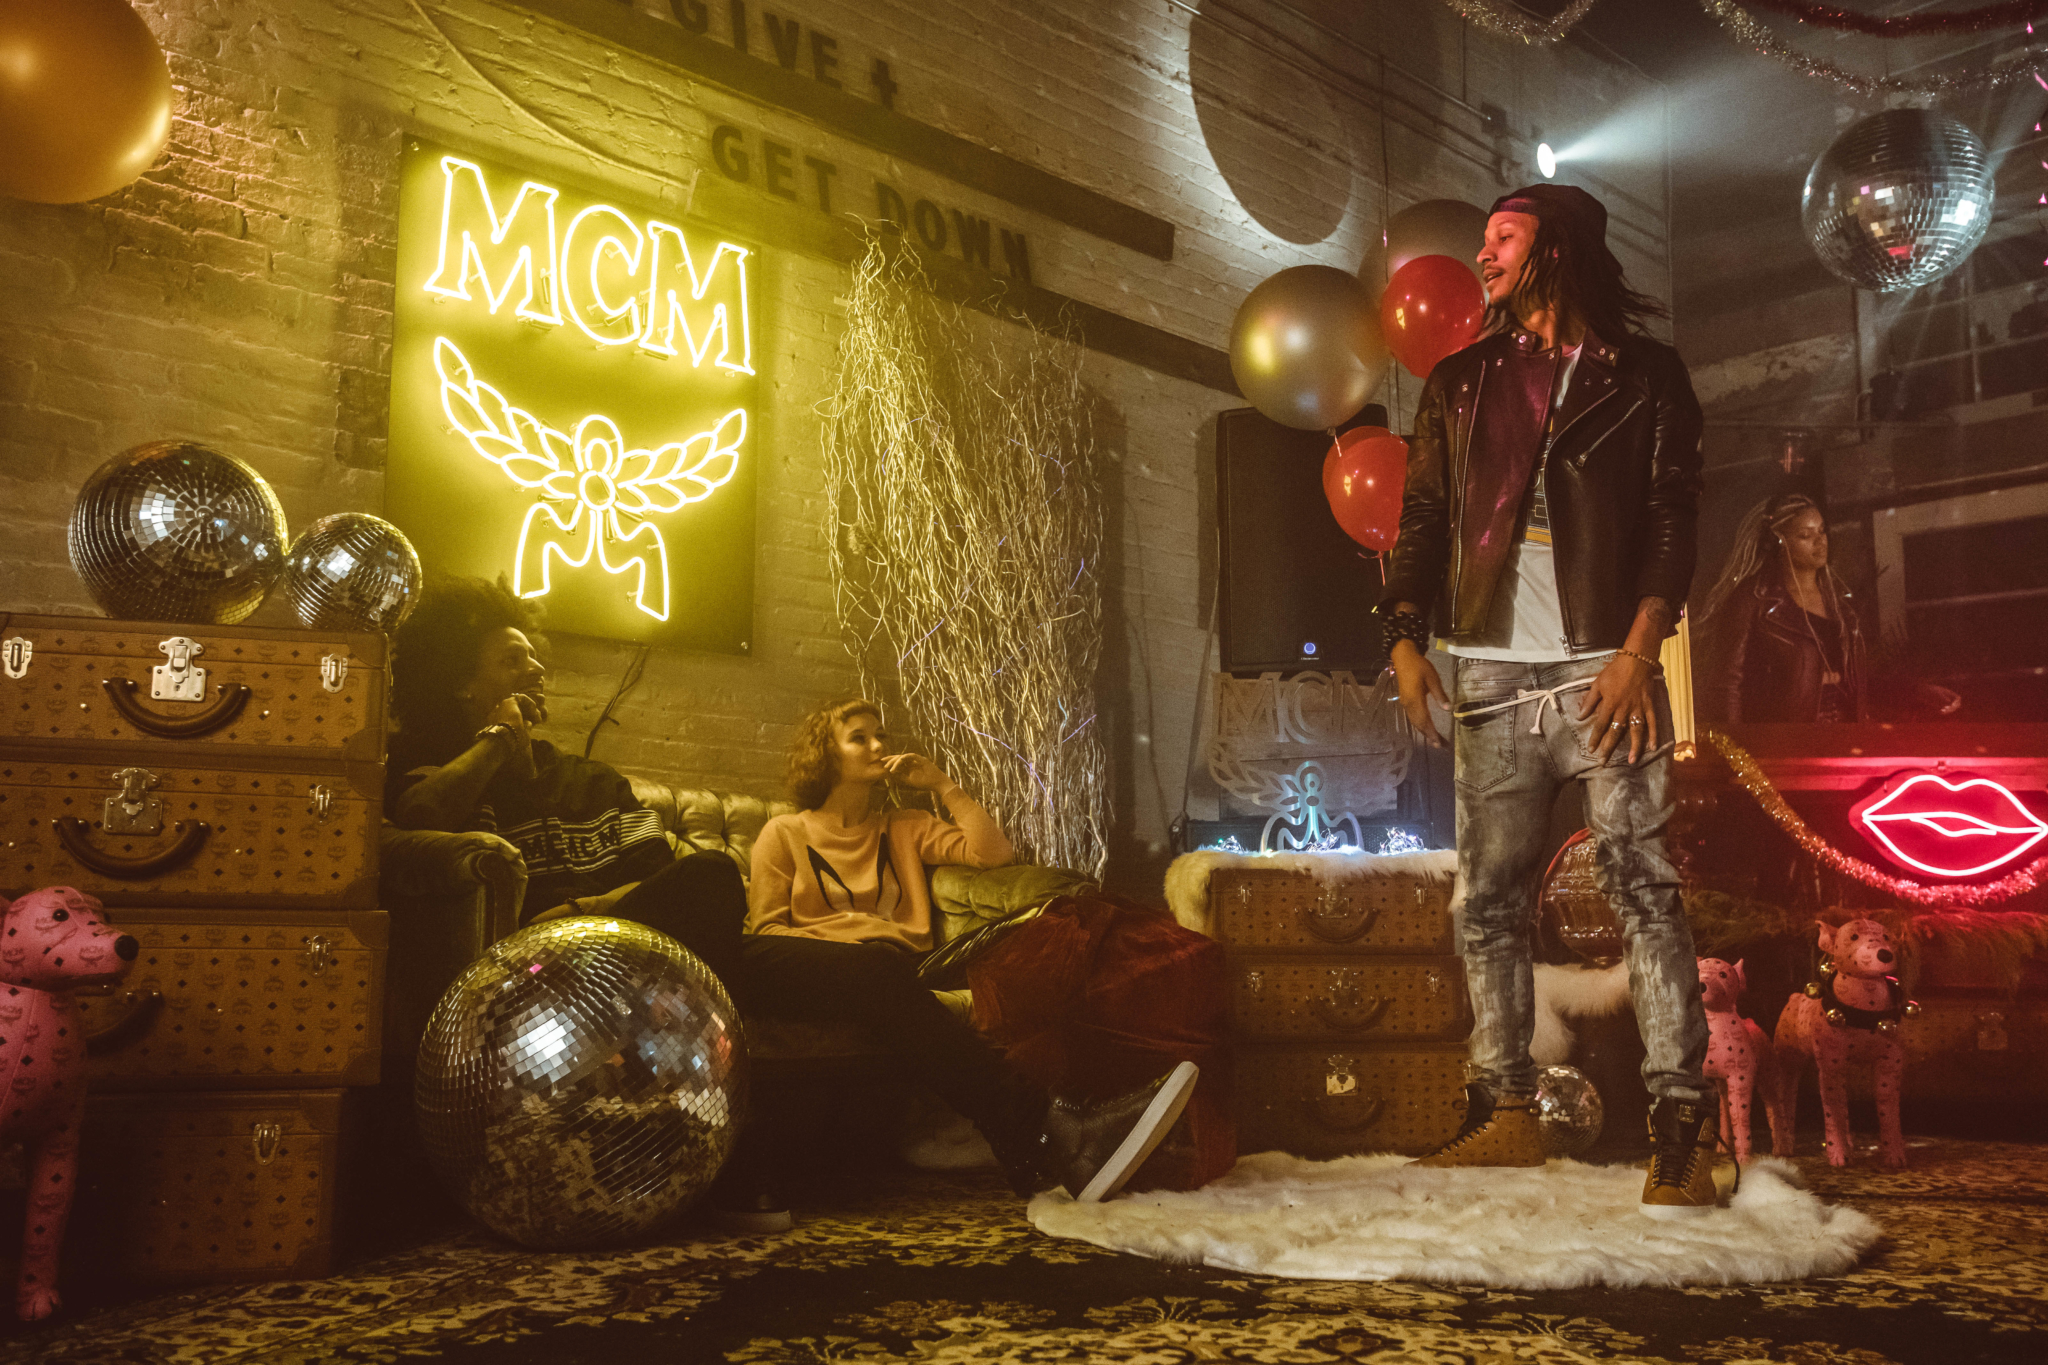 MCM Holiday 2017